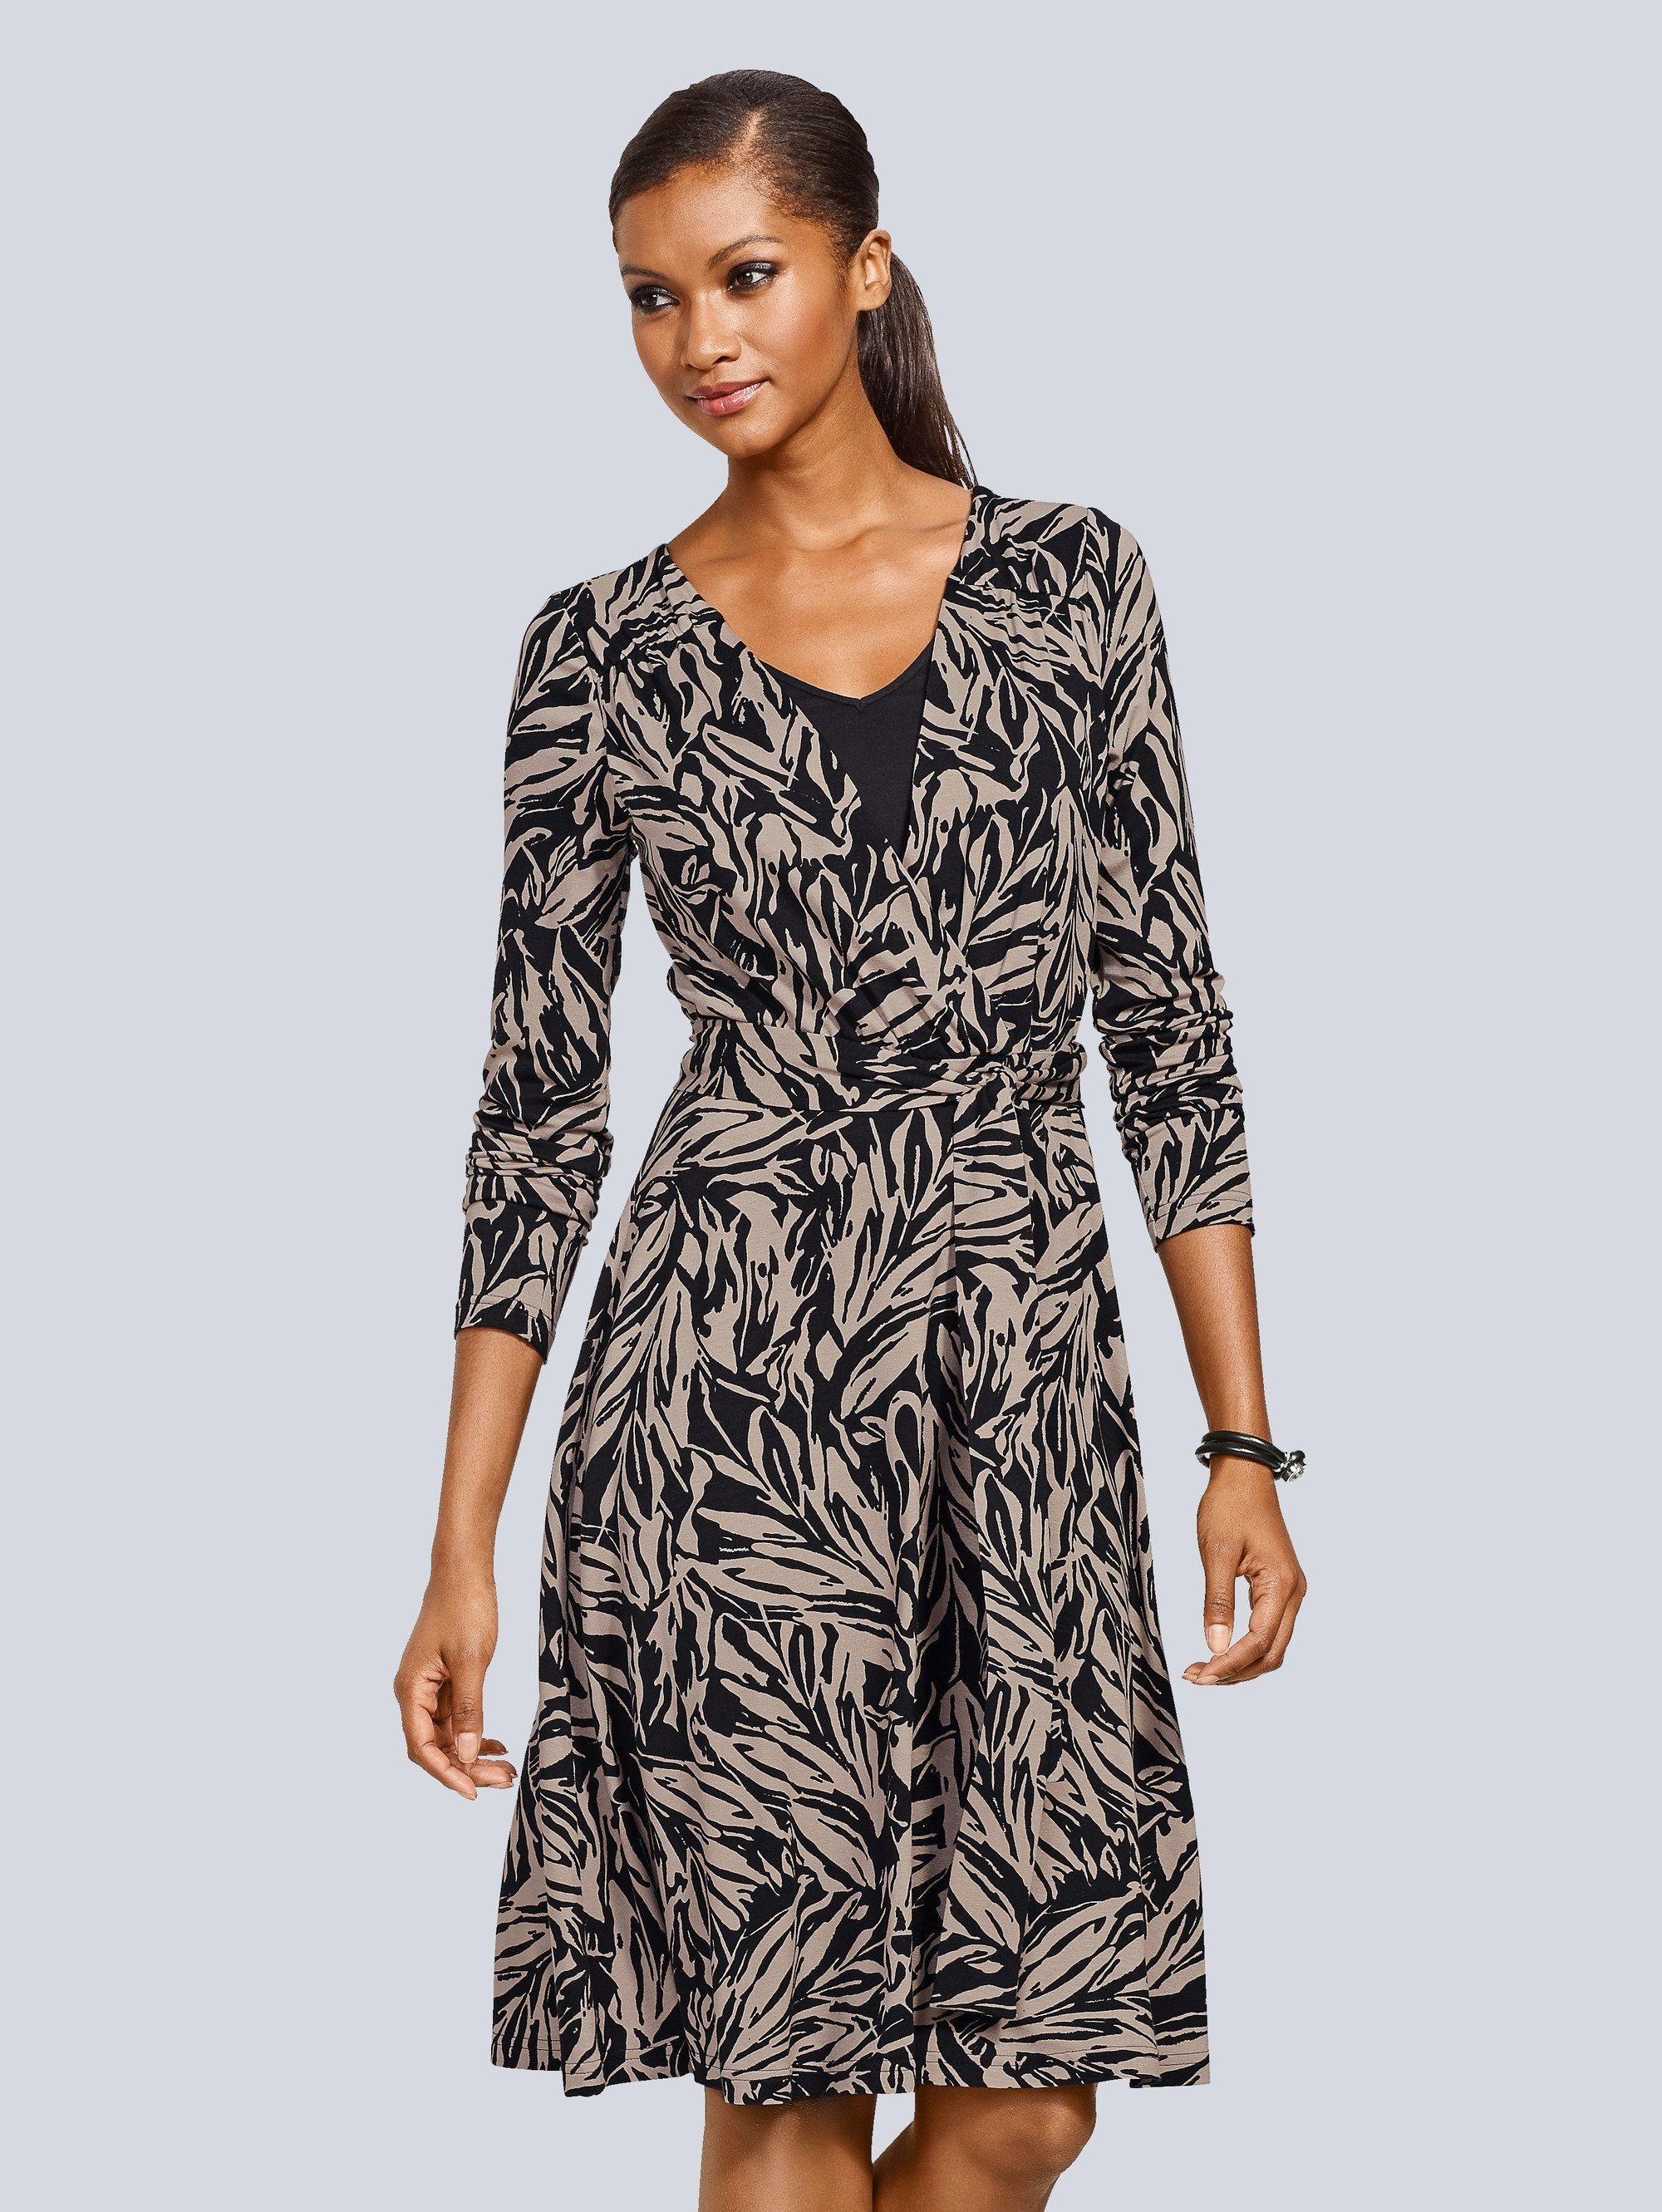 Alba Moda Jerseykleid in schöner Wickeloptik